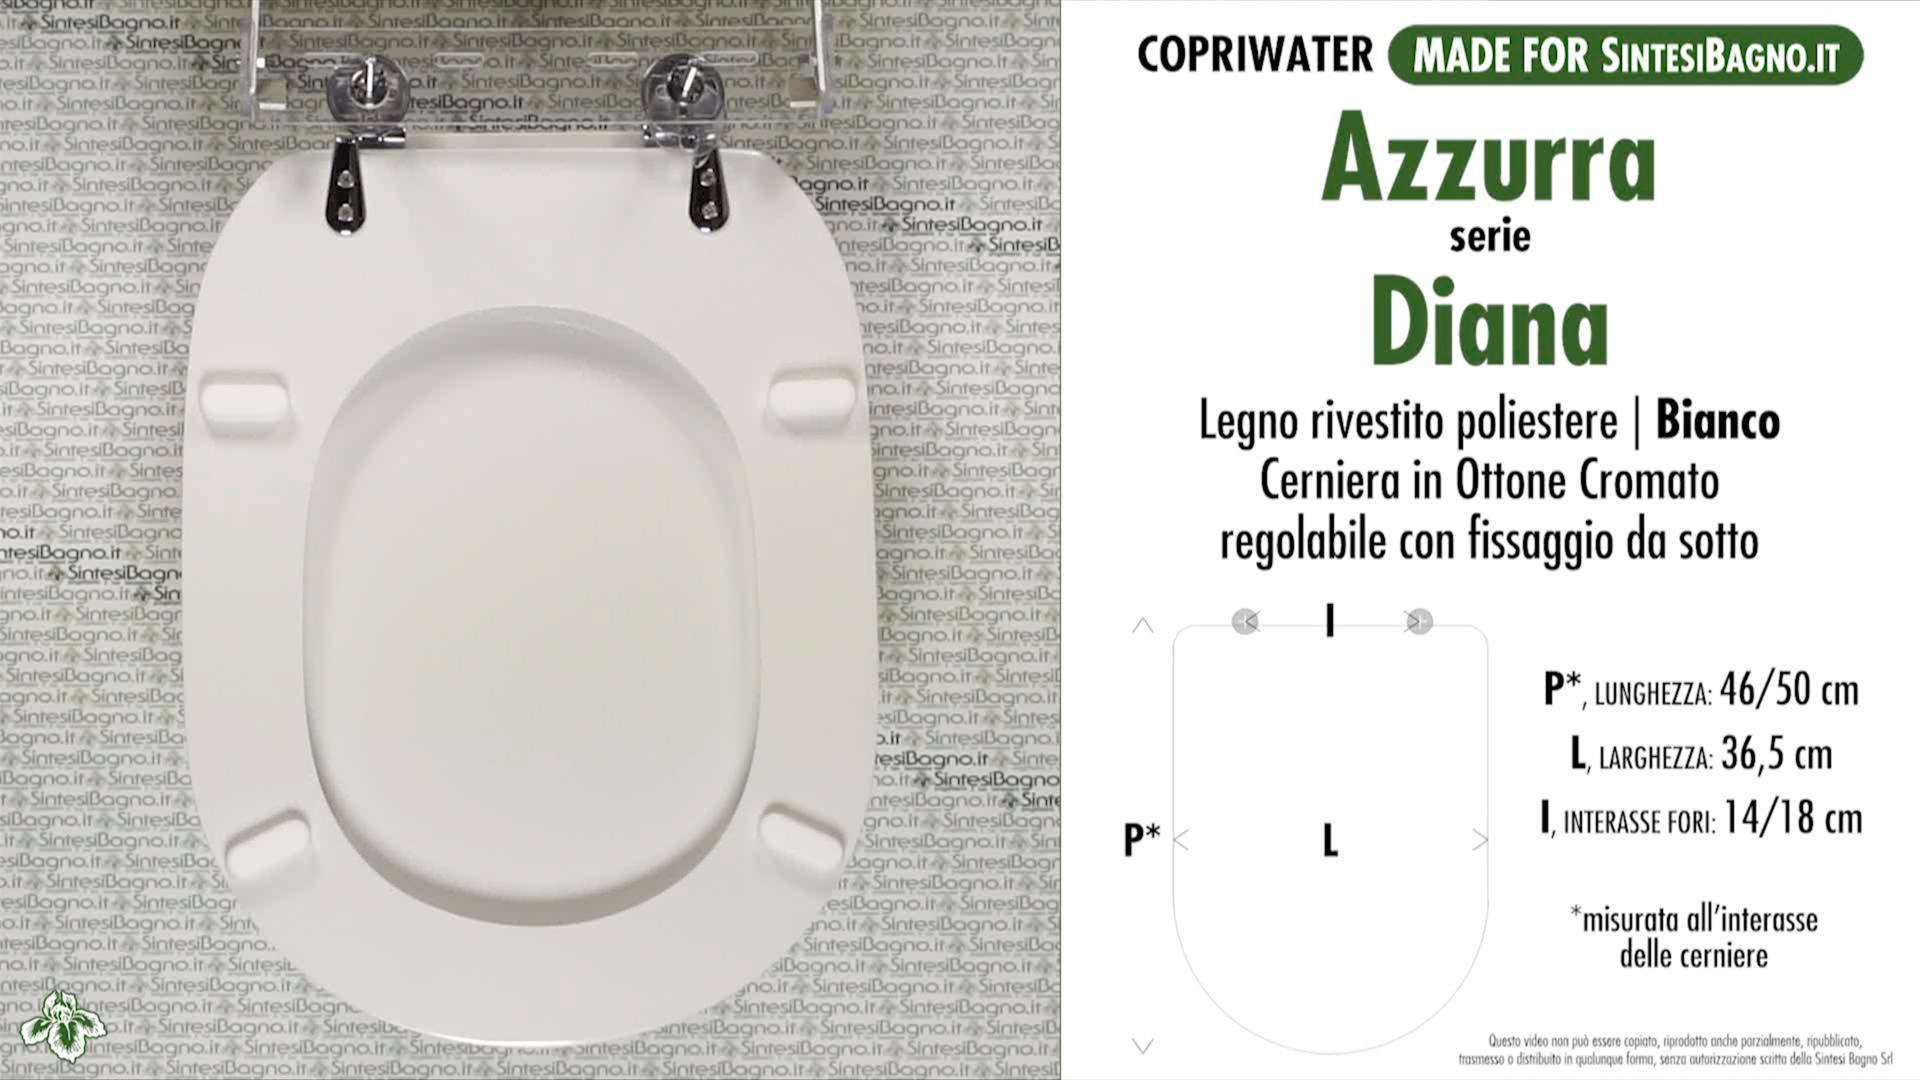 SCHEDA TECNICA MISURE copriwater AZZURRA DIANA